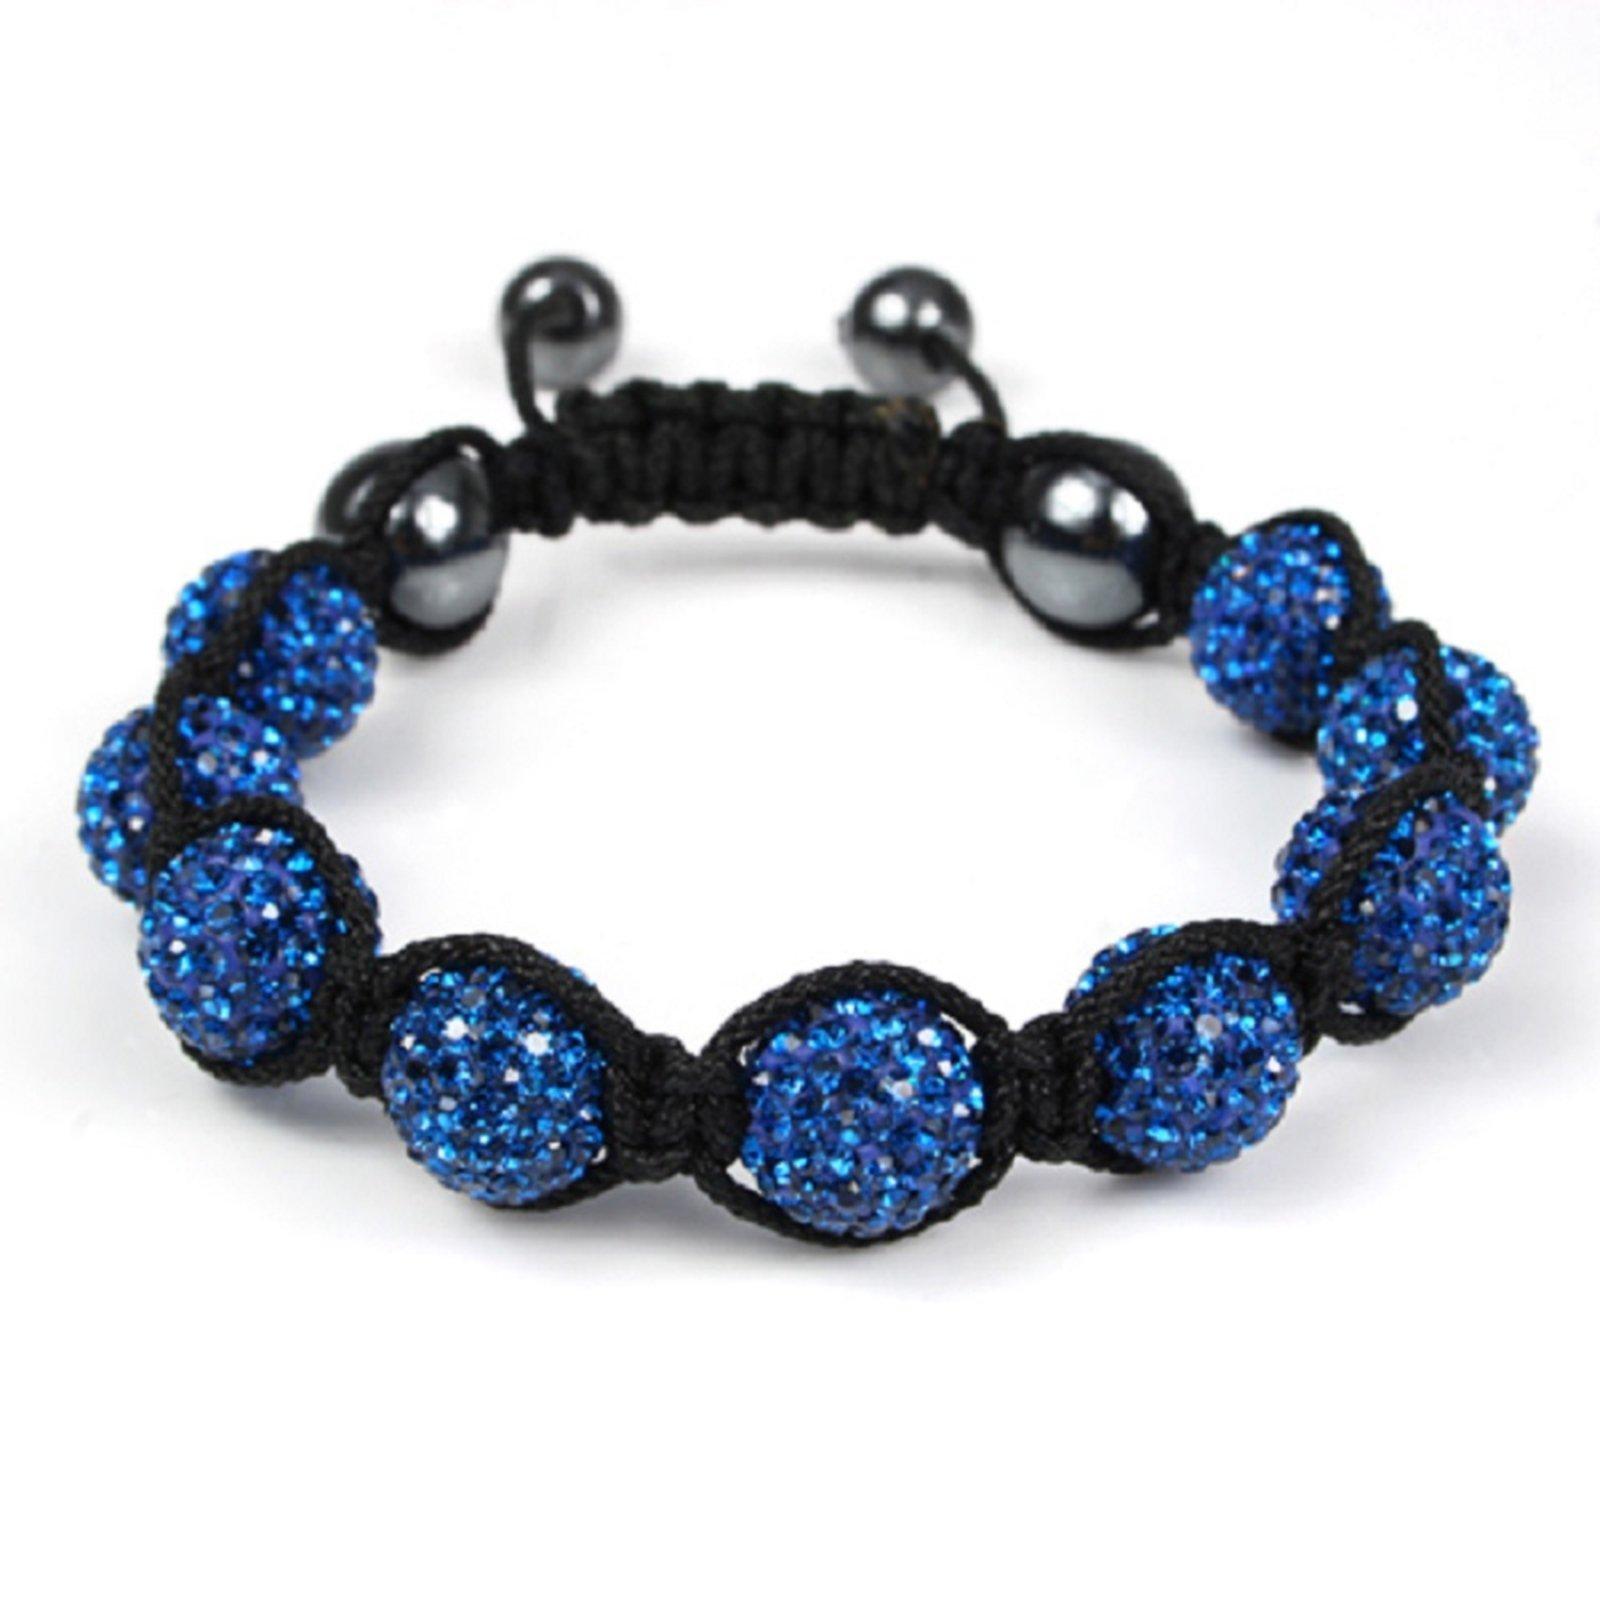 Pulseira Bracelete Tudo Jóias Shambala Cor Azul - Marca Tudo Jóias